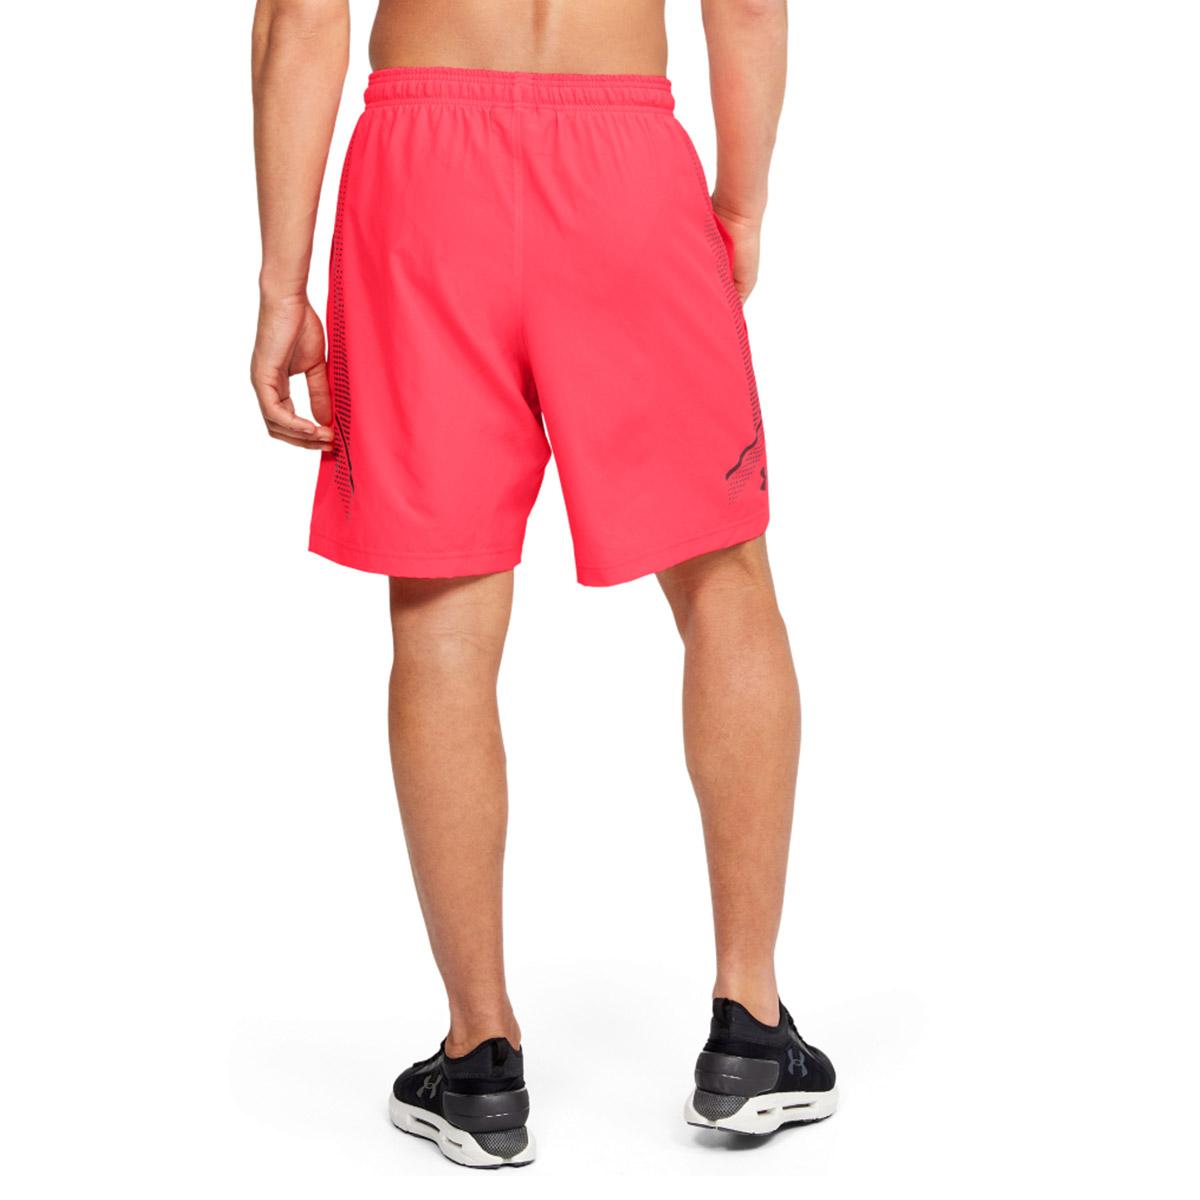 Under-Armour-Homme-2020-Tisse-graphique-Leger-Respirable-Wicking-Shorts miniature 9